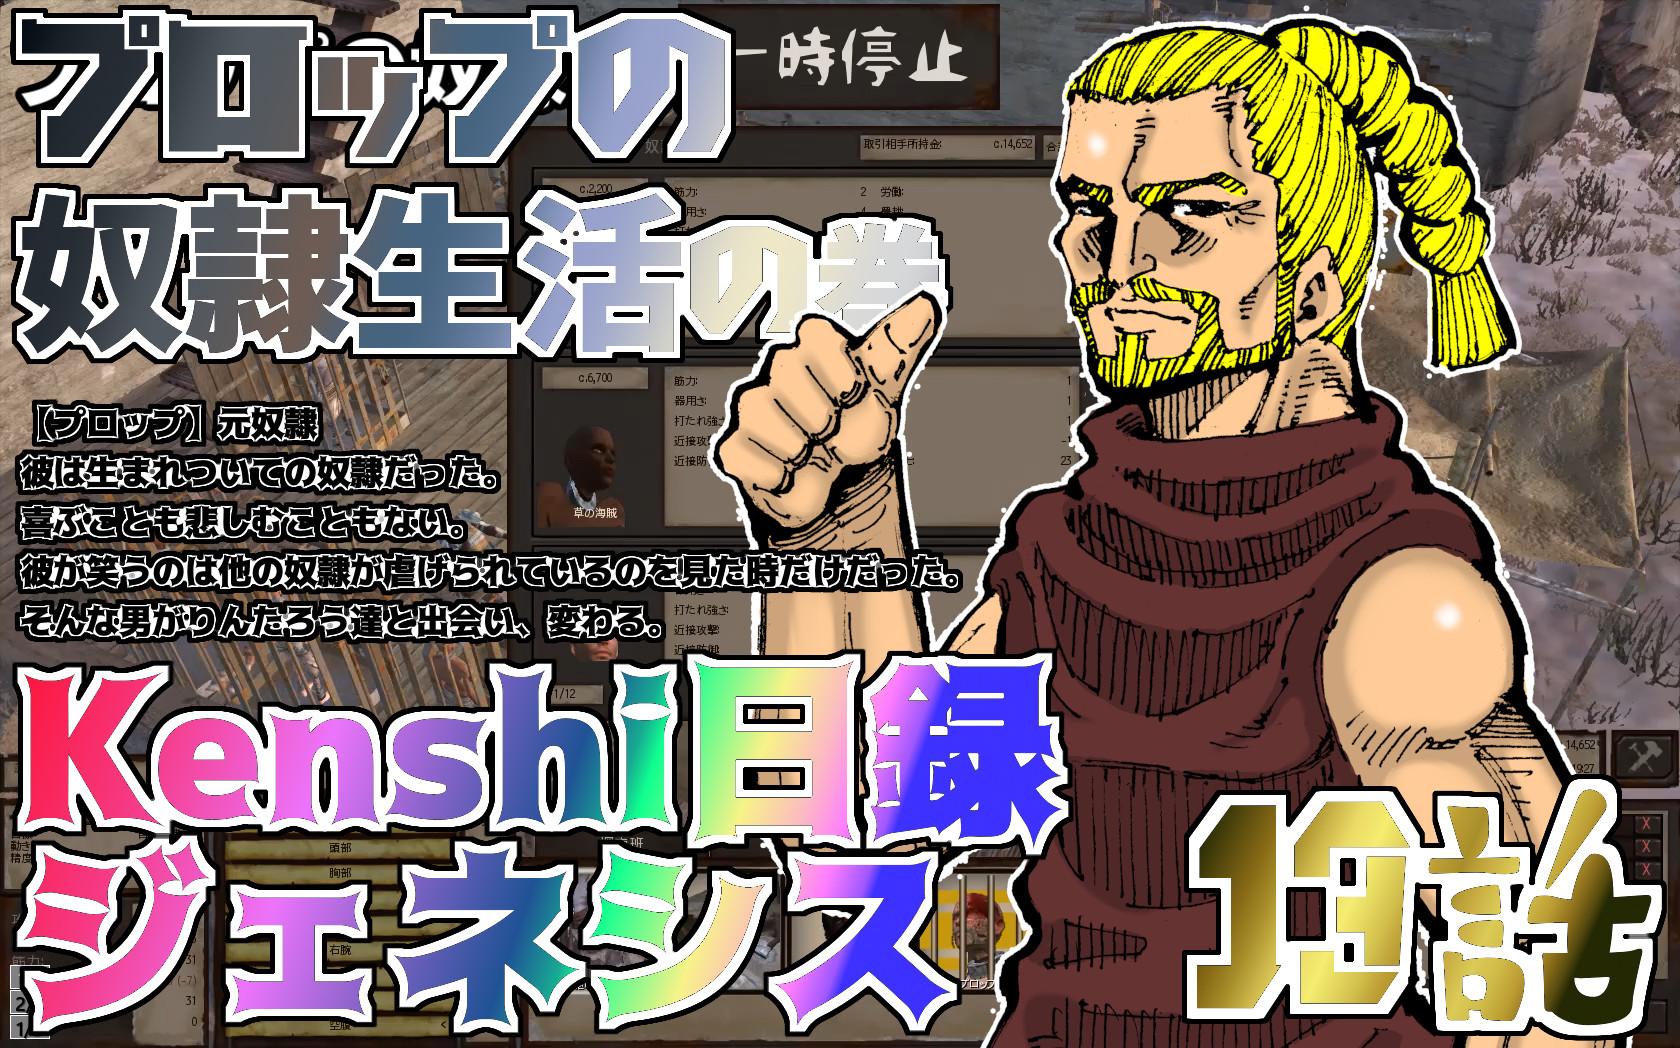 Kenshi日録ジェネシス13話_プロップの奴隷生活の巻